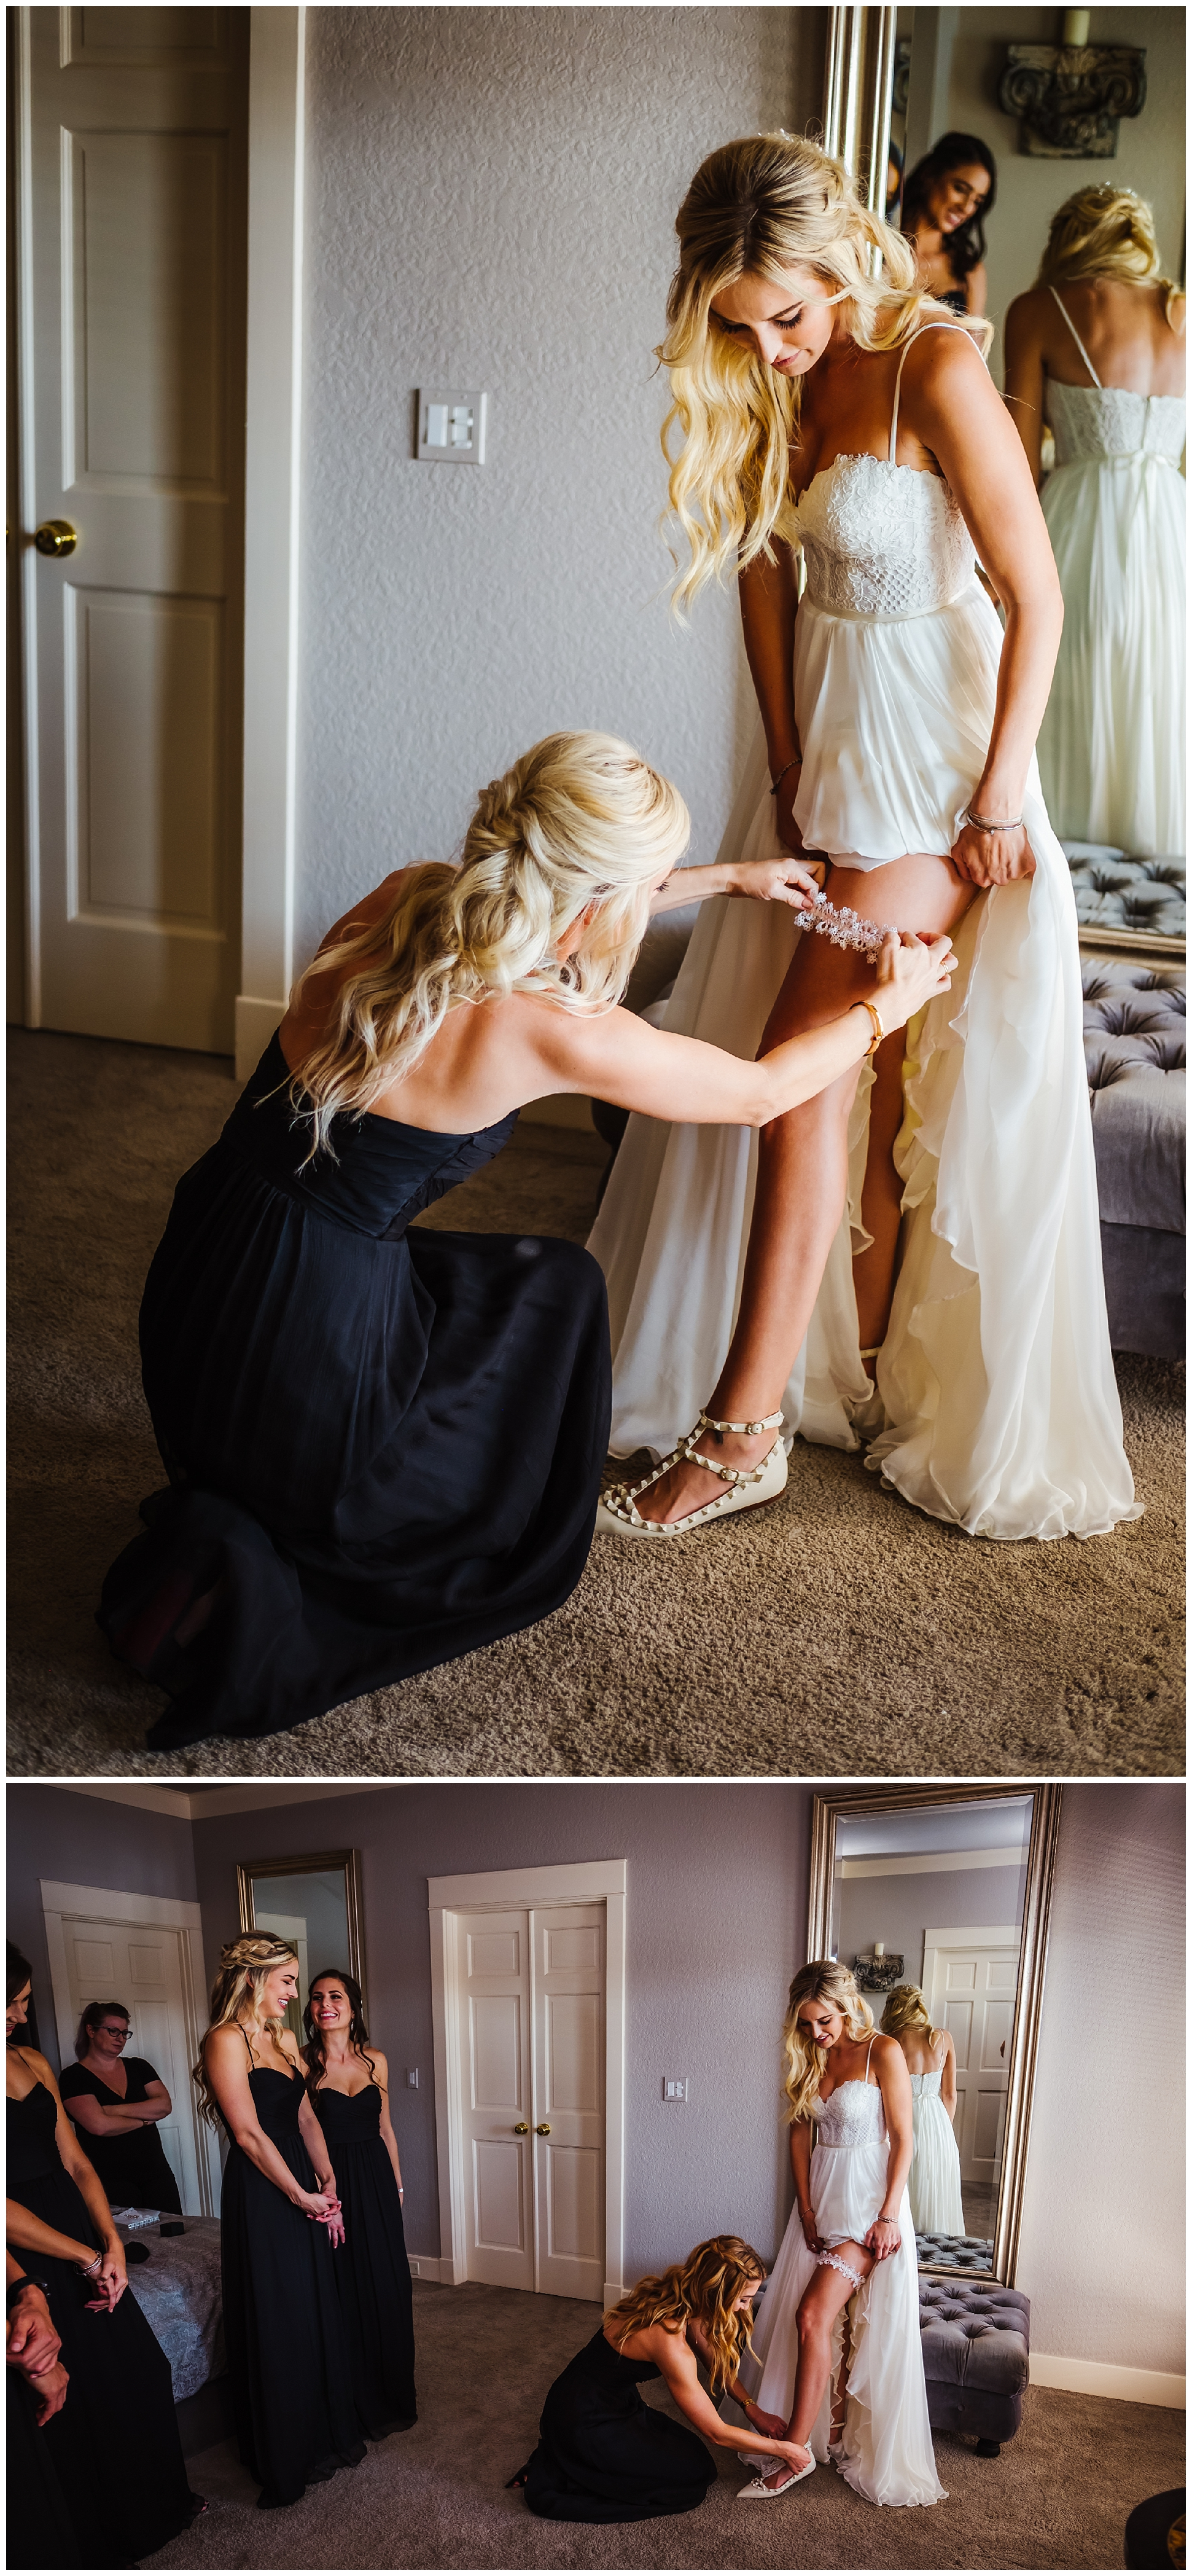 st-pete-wedding-photographer-backyard-luxury-snell-isle-vinoy_0011.jpg